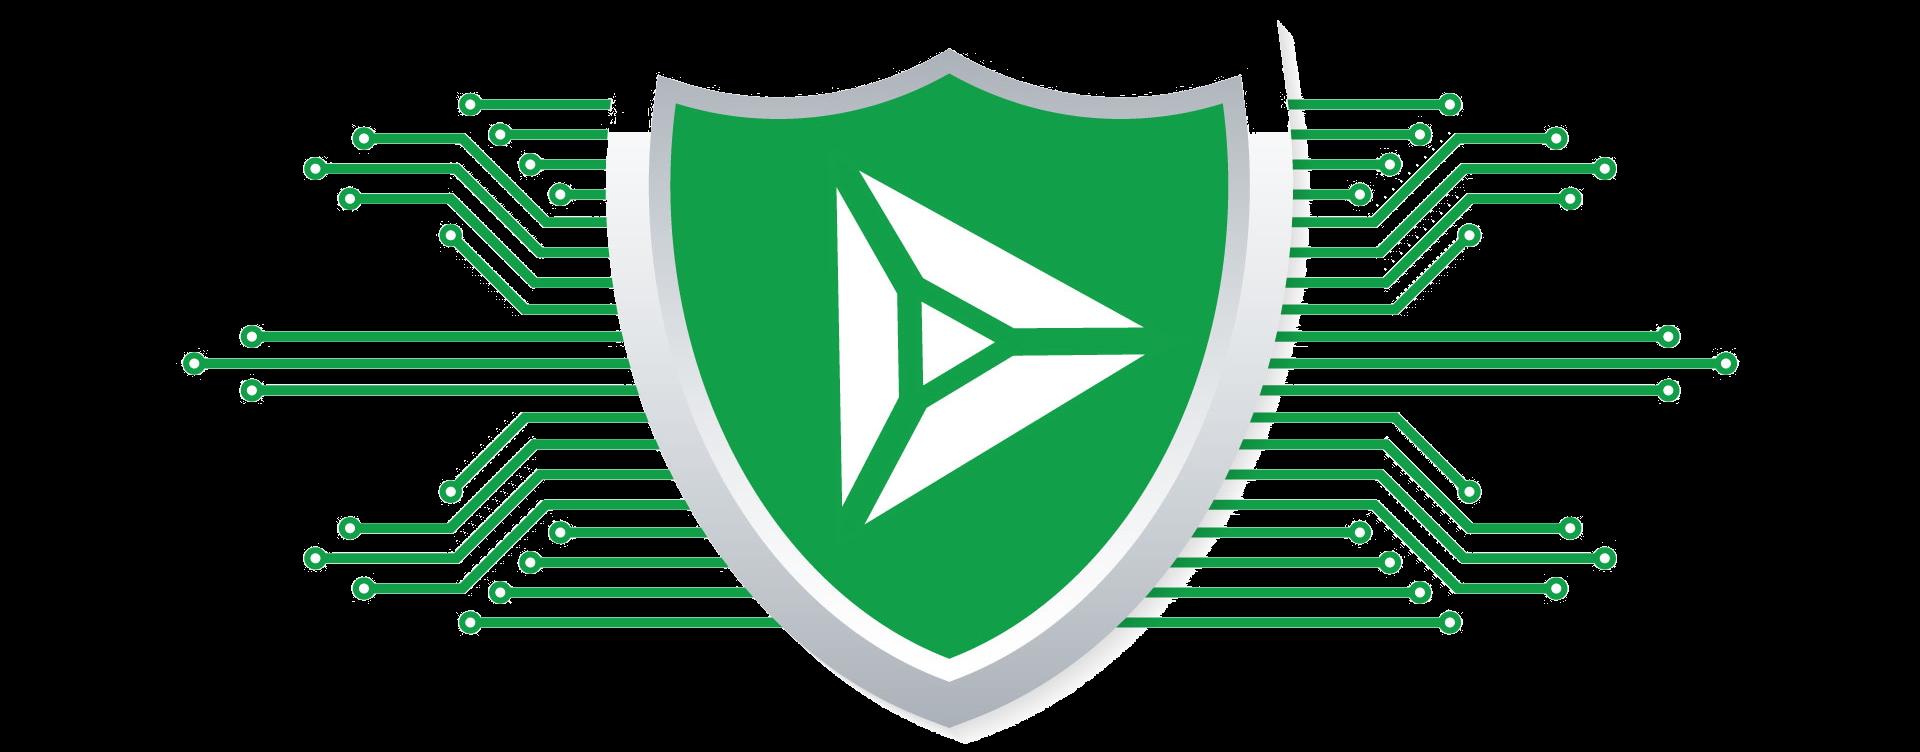 shield-shock-box-cover-new-logo